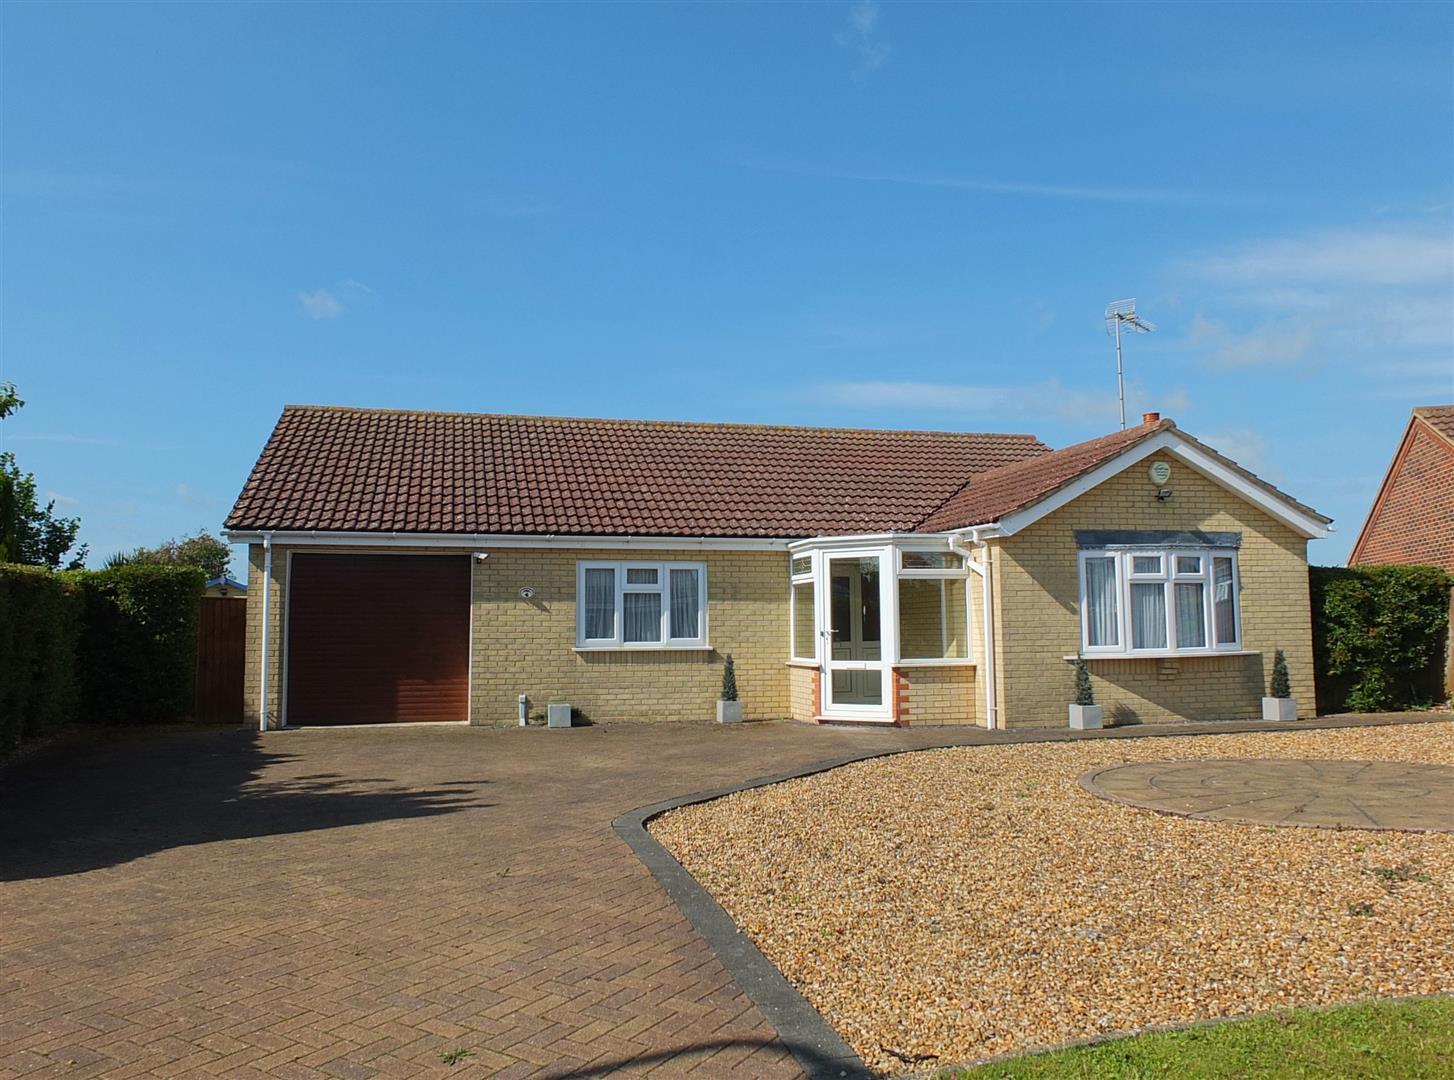 3 bed detached bungalow for sale in Skelton Drive, Long Sutton Spalding 0